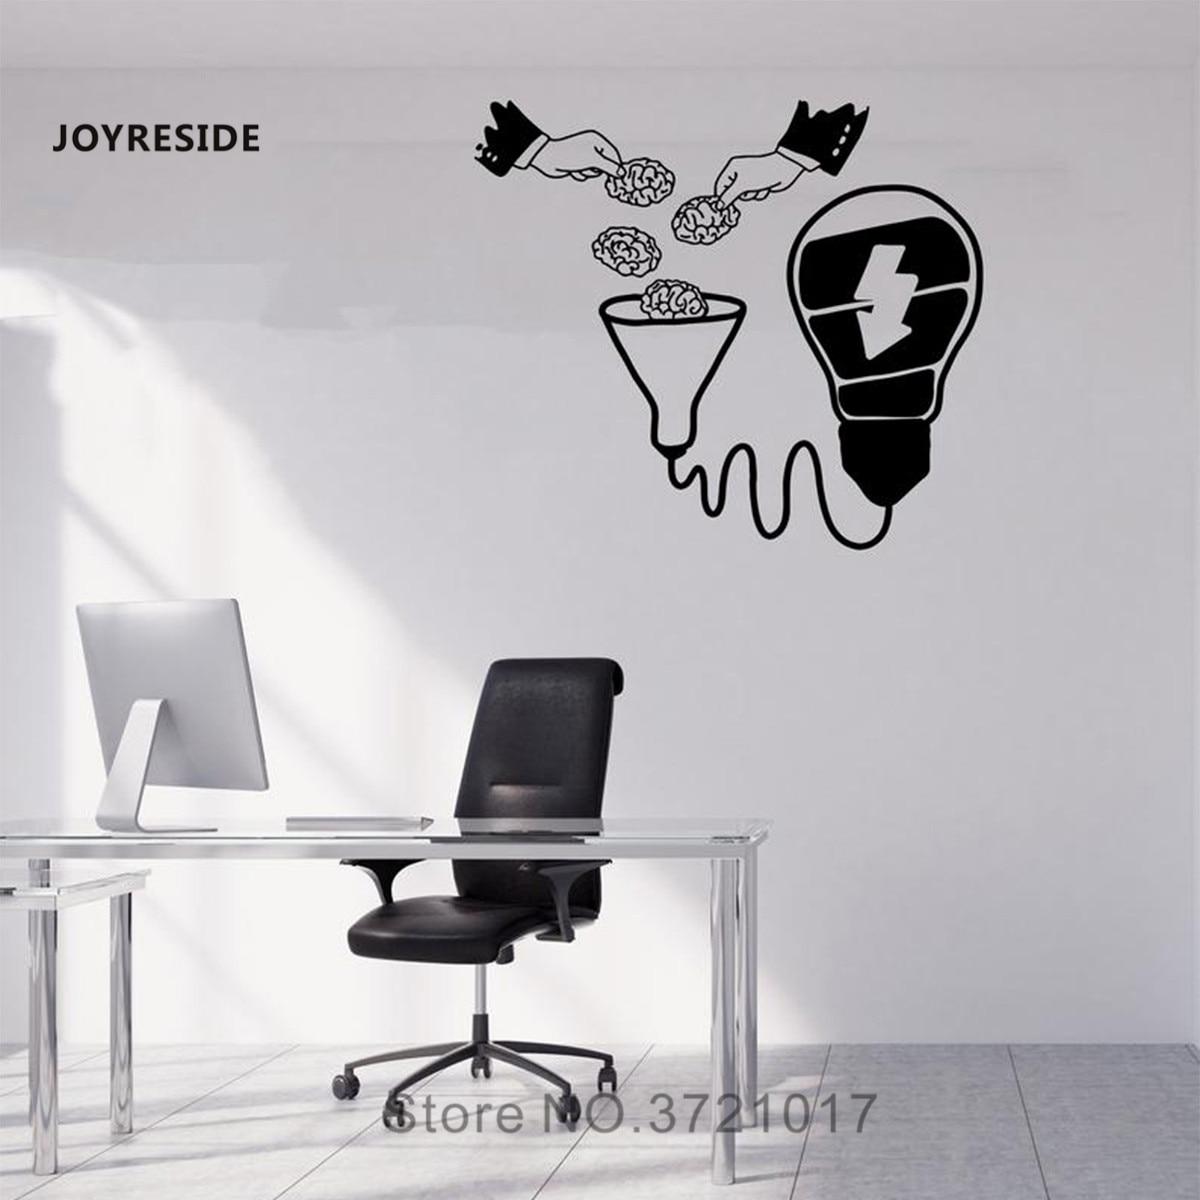 Joyresie Oficina negocios calcomanías de pared bombilla Idea pegatina de pared equipo de oficina en casa trabajo decoración de pared pensamientos Idea calcomanía WM417